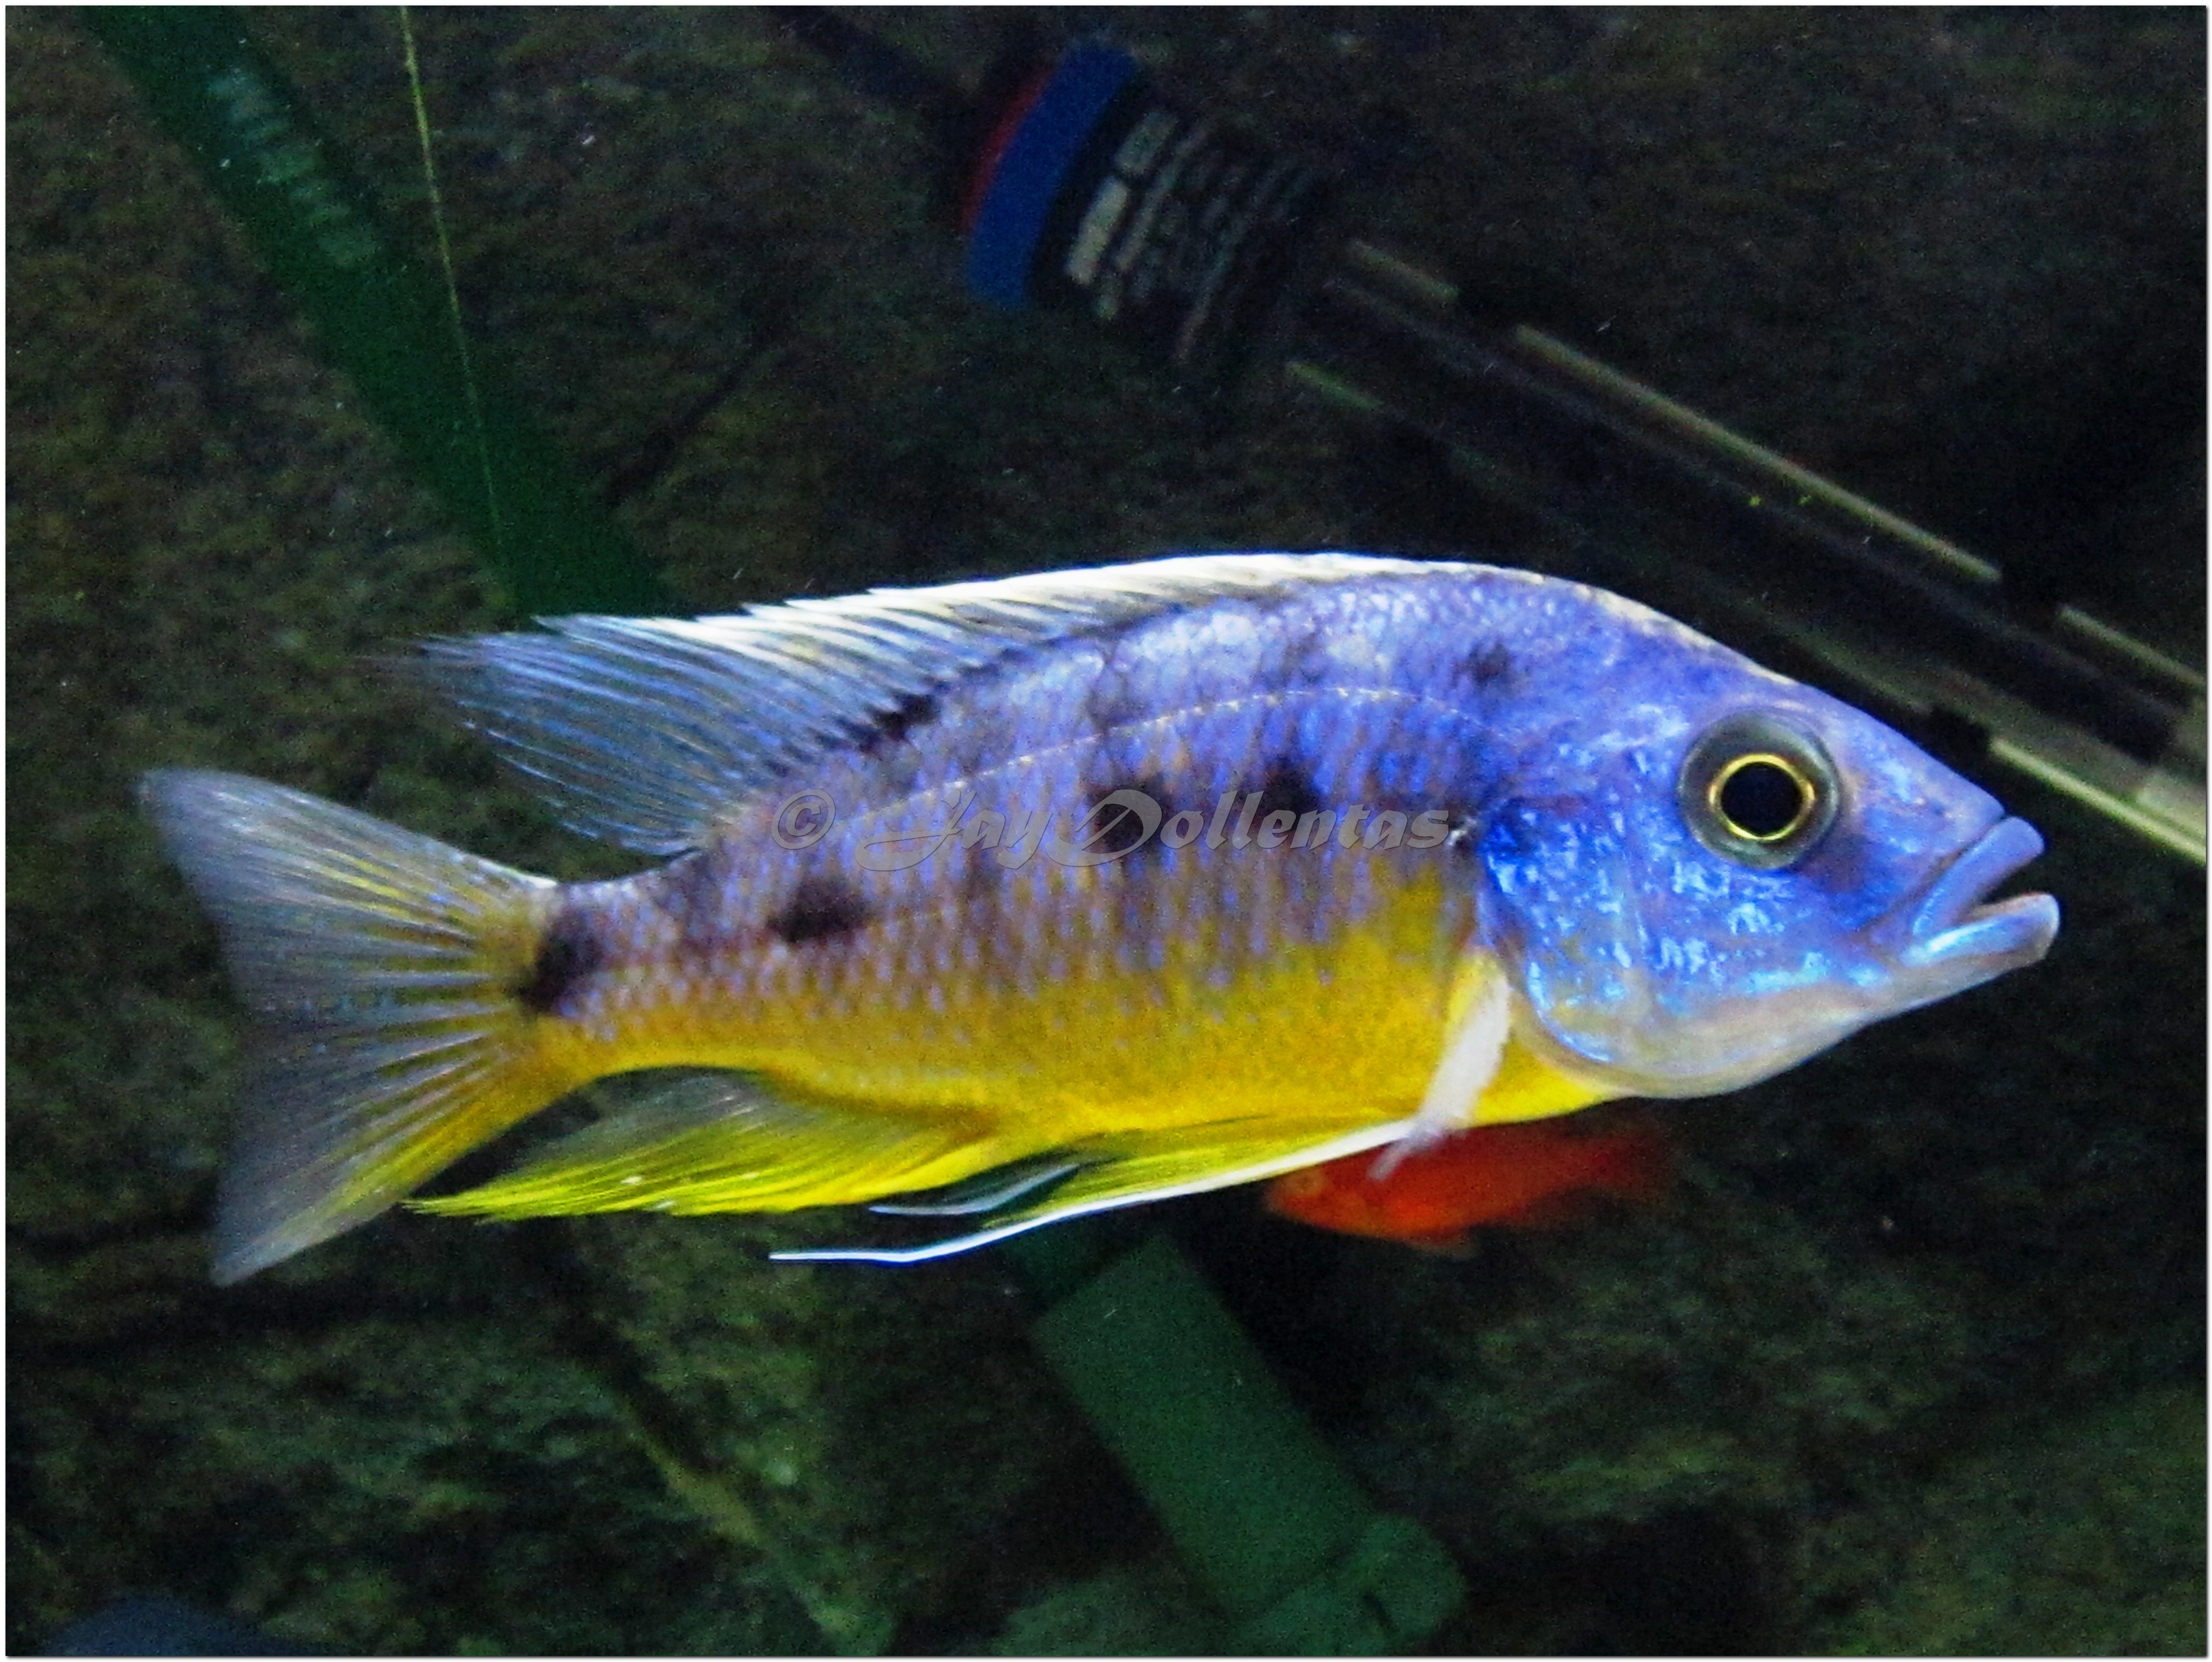 Protomelas sp Spilonotus Tanzania Protomelas sp Quot Spilonotus